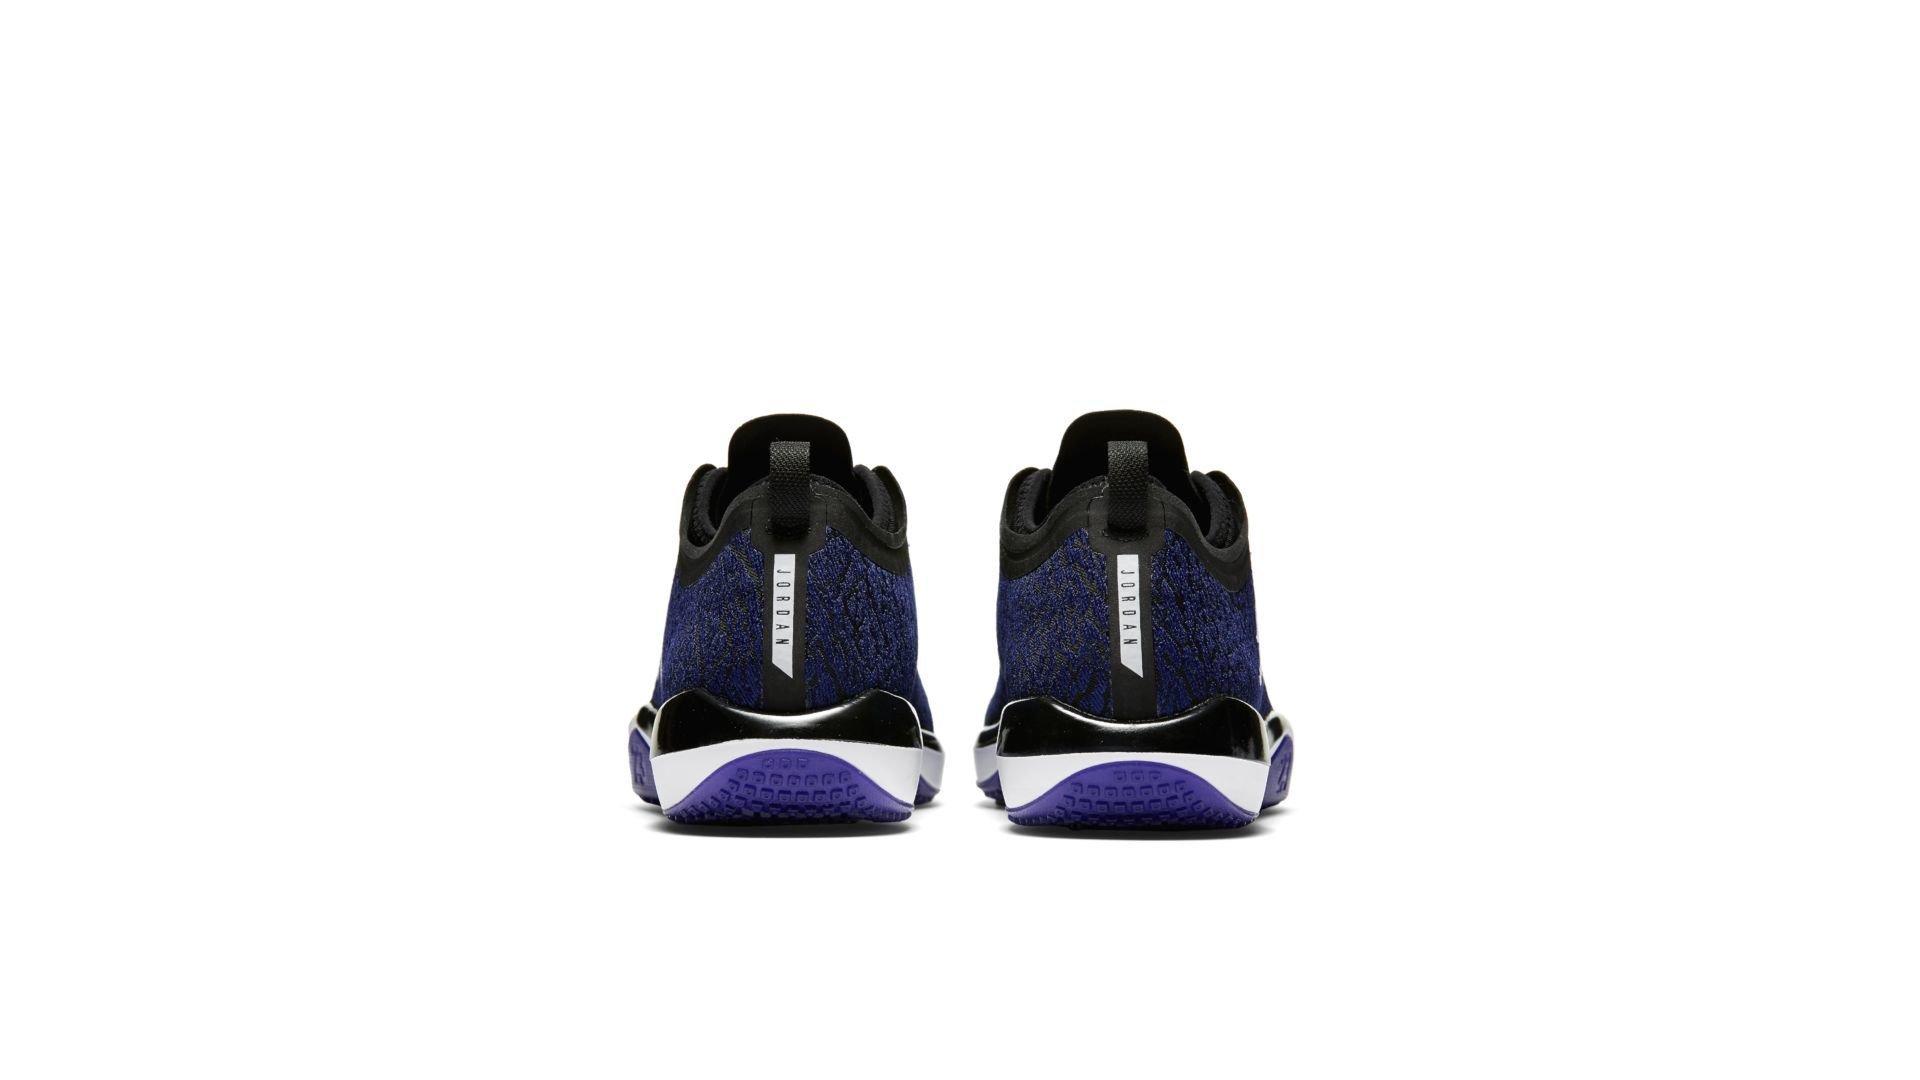 Jordan Trainer 1 Low Concord (845403-003)